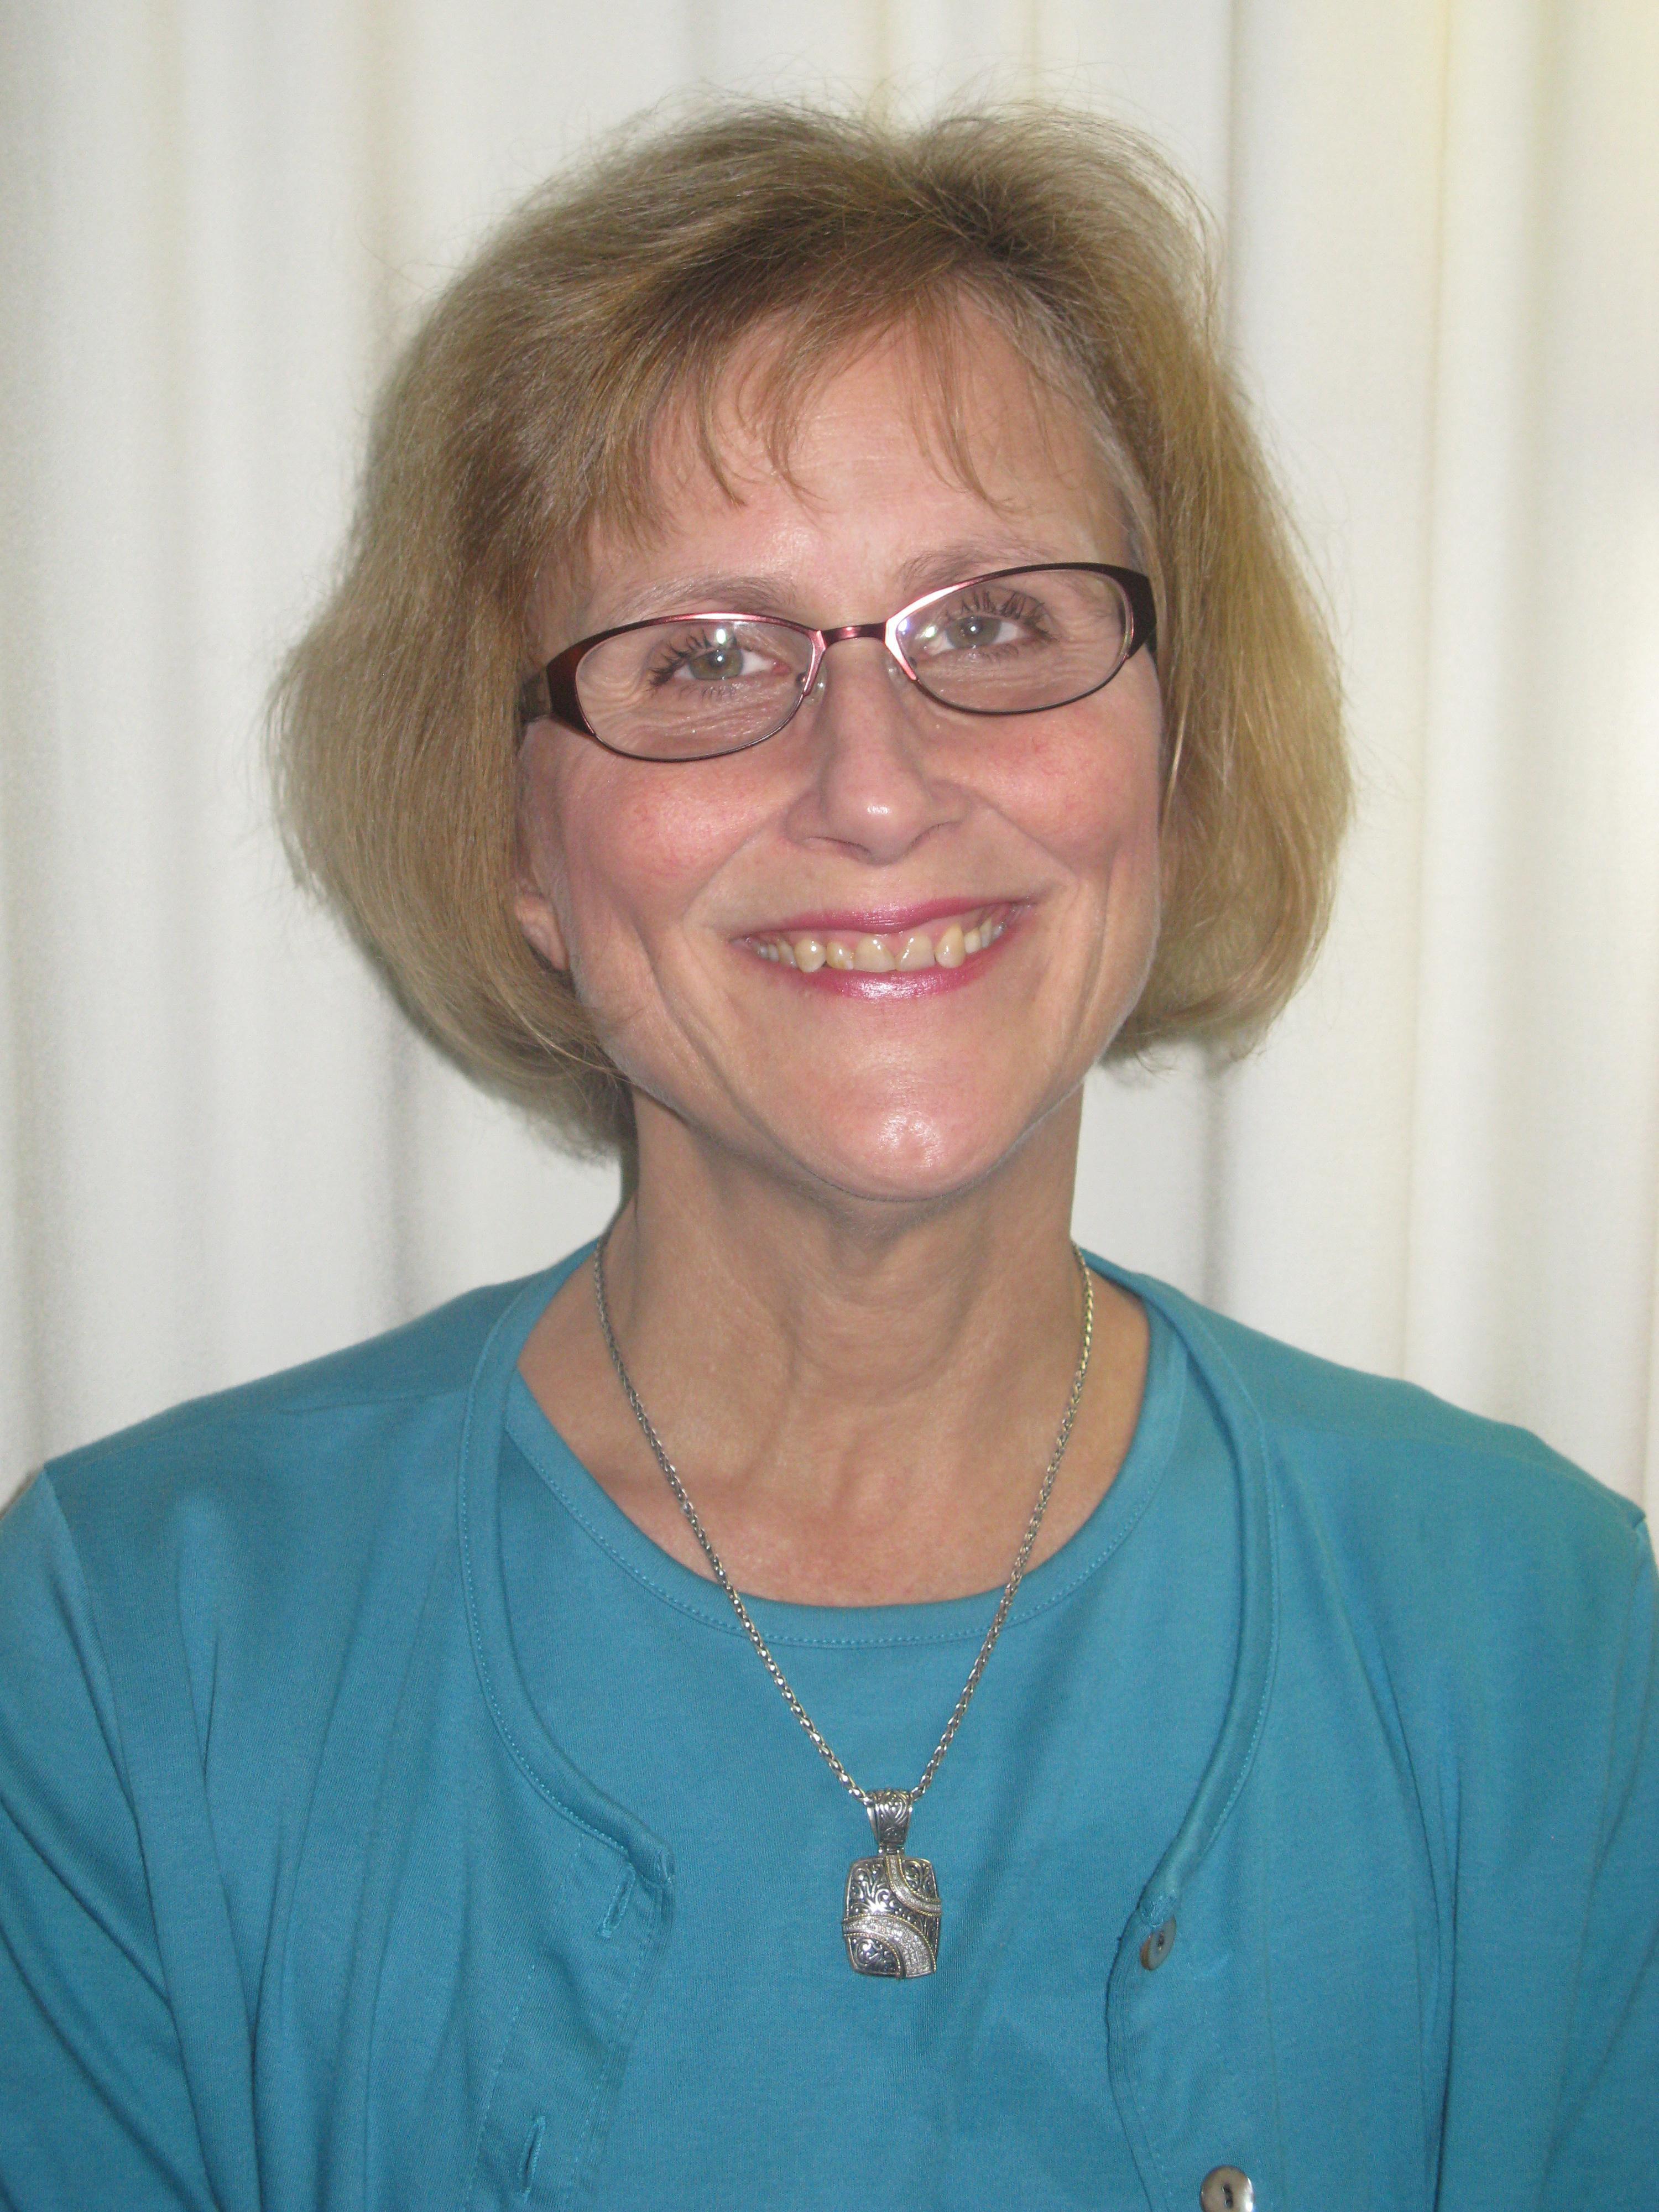 Cheryl U. Johnson